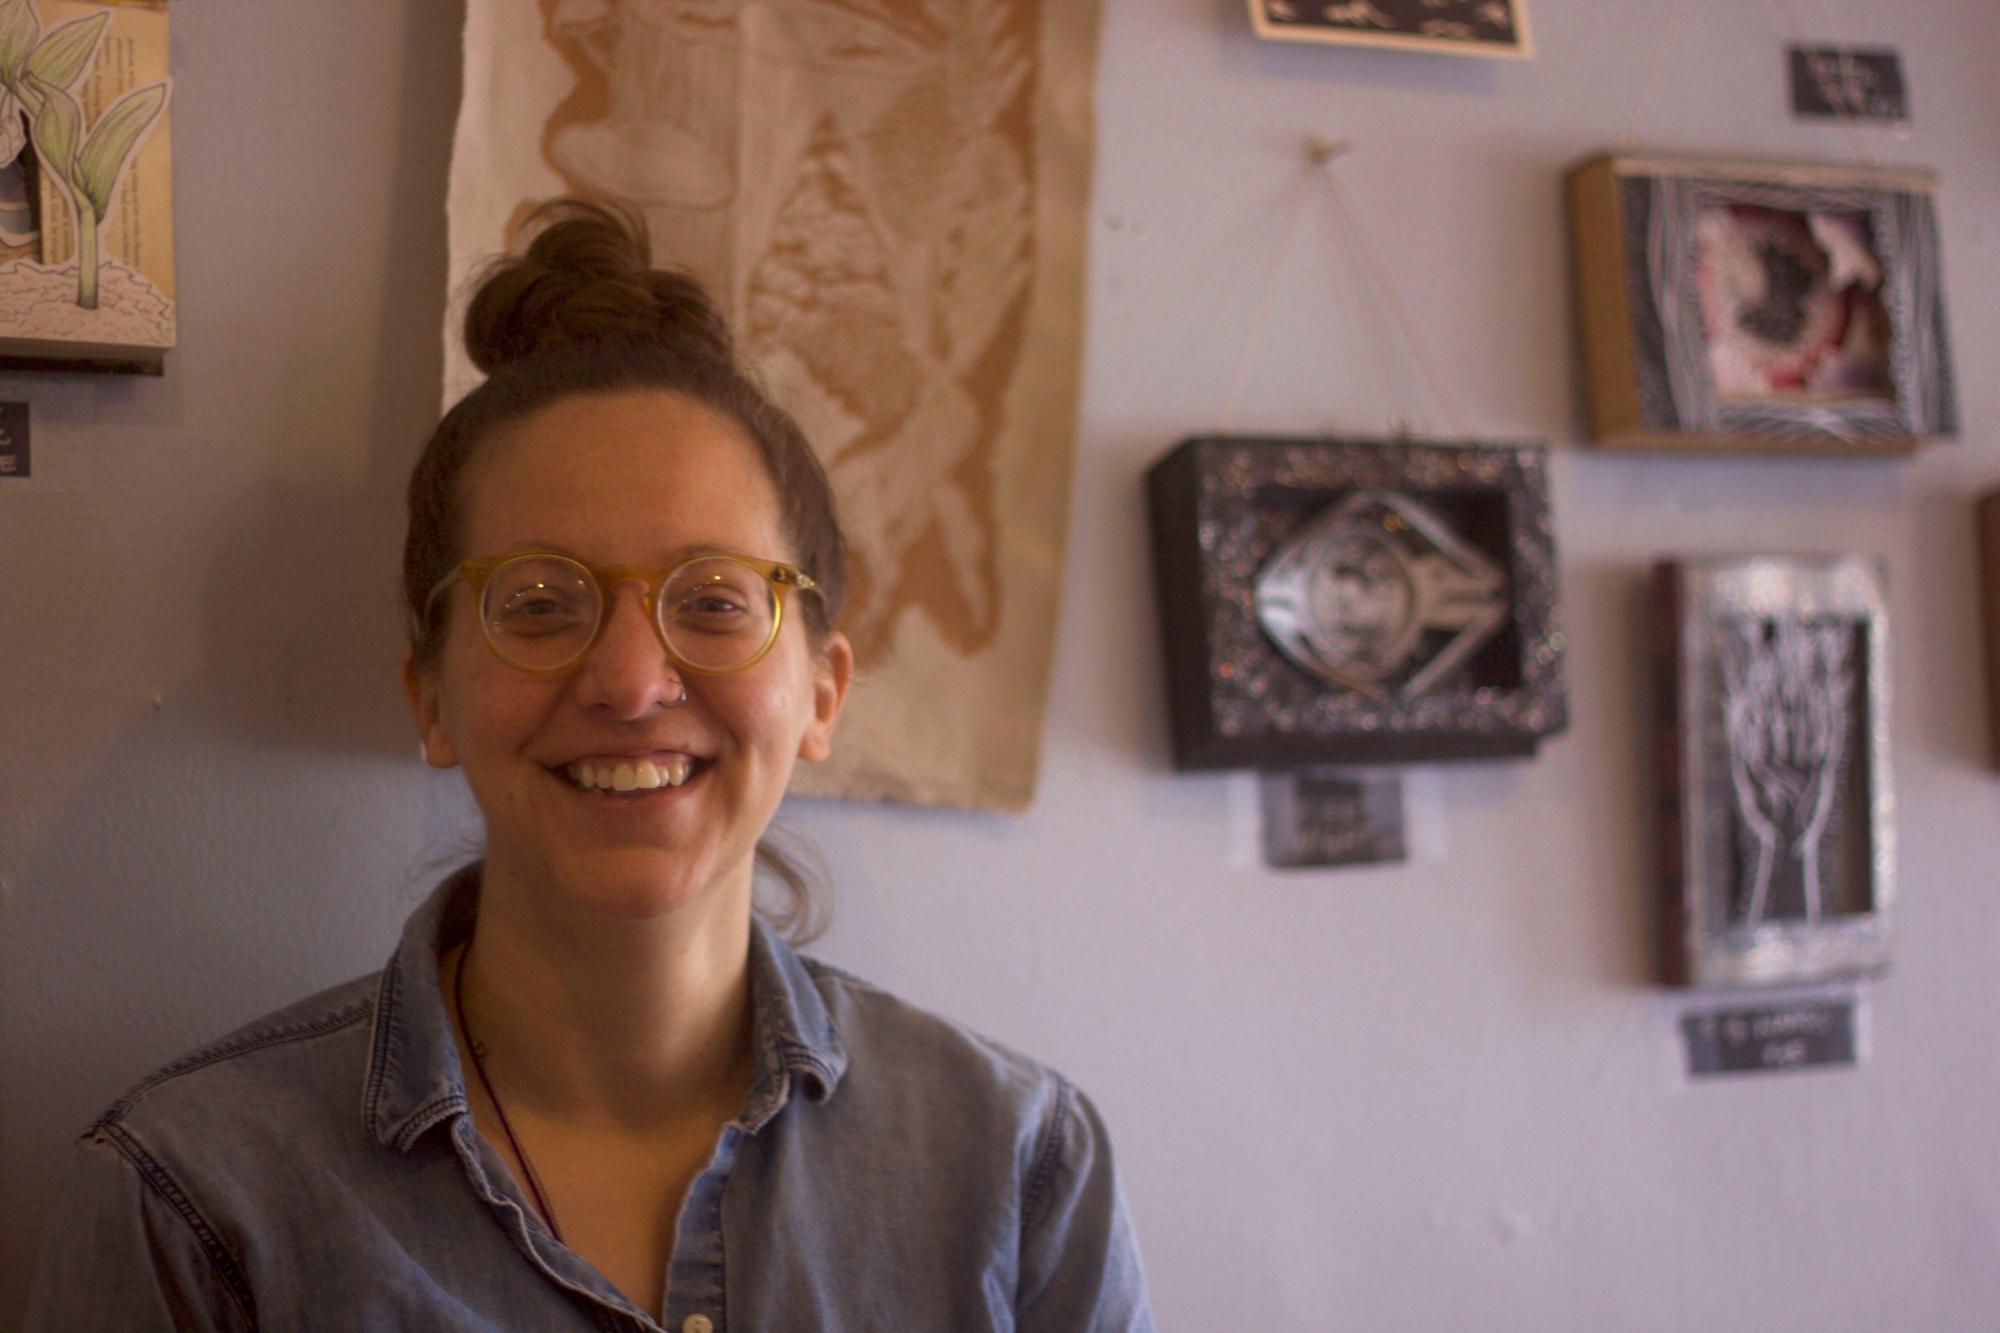 Ada   , at the worker-owned    Firestorm Books and Coffee   , where    the Center for Participatory Change    also has its offices.    Ada , en  Firestorm Books and Coffee , una librería y cafe cooperativa, donde  el Centro Para Cambios Participativos  (en inglés: The Center for Participatory Change) tiene sus oficinas.